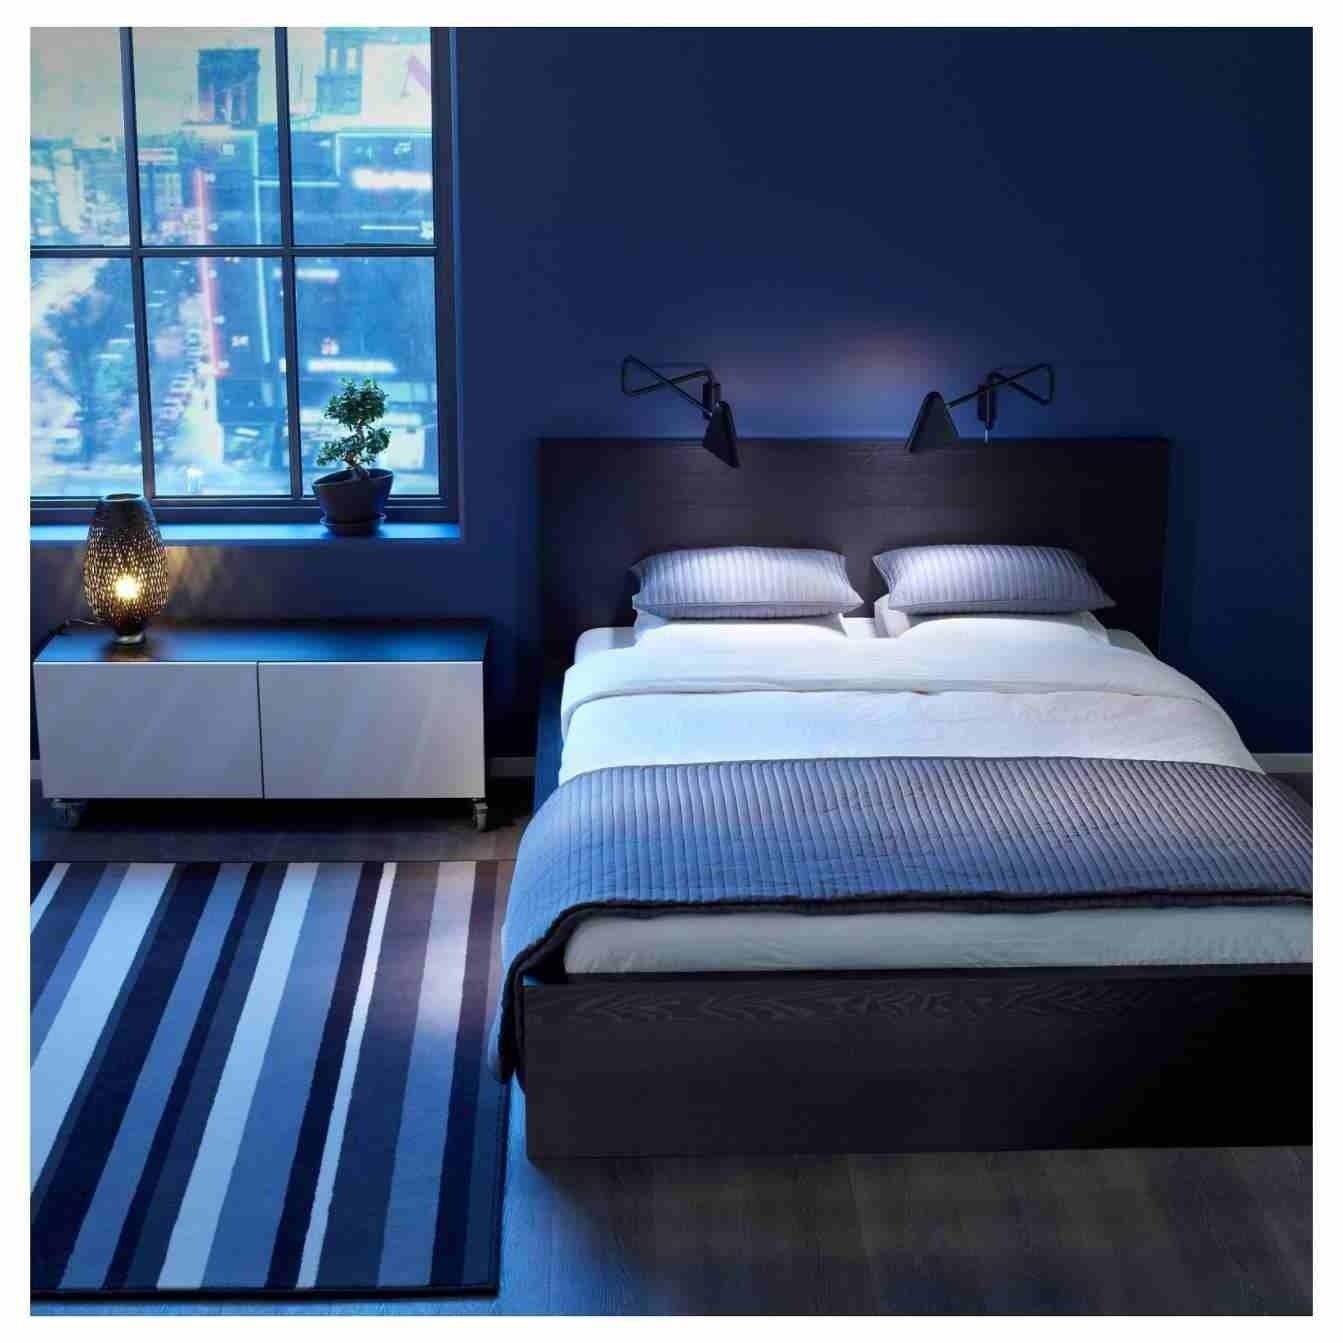 10 Stylish Blue And White Bedroom Ideas dark white and dark blue bedroom blue and white bedroom ideas u 2020